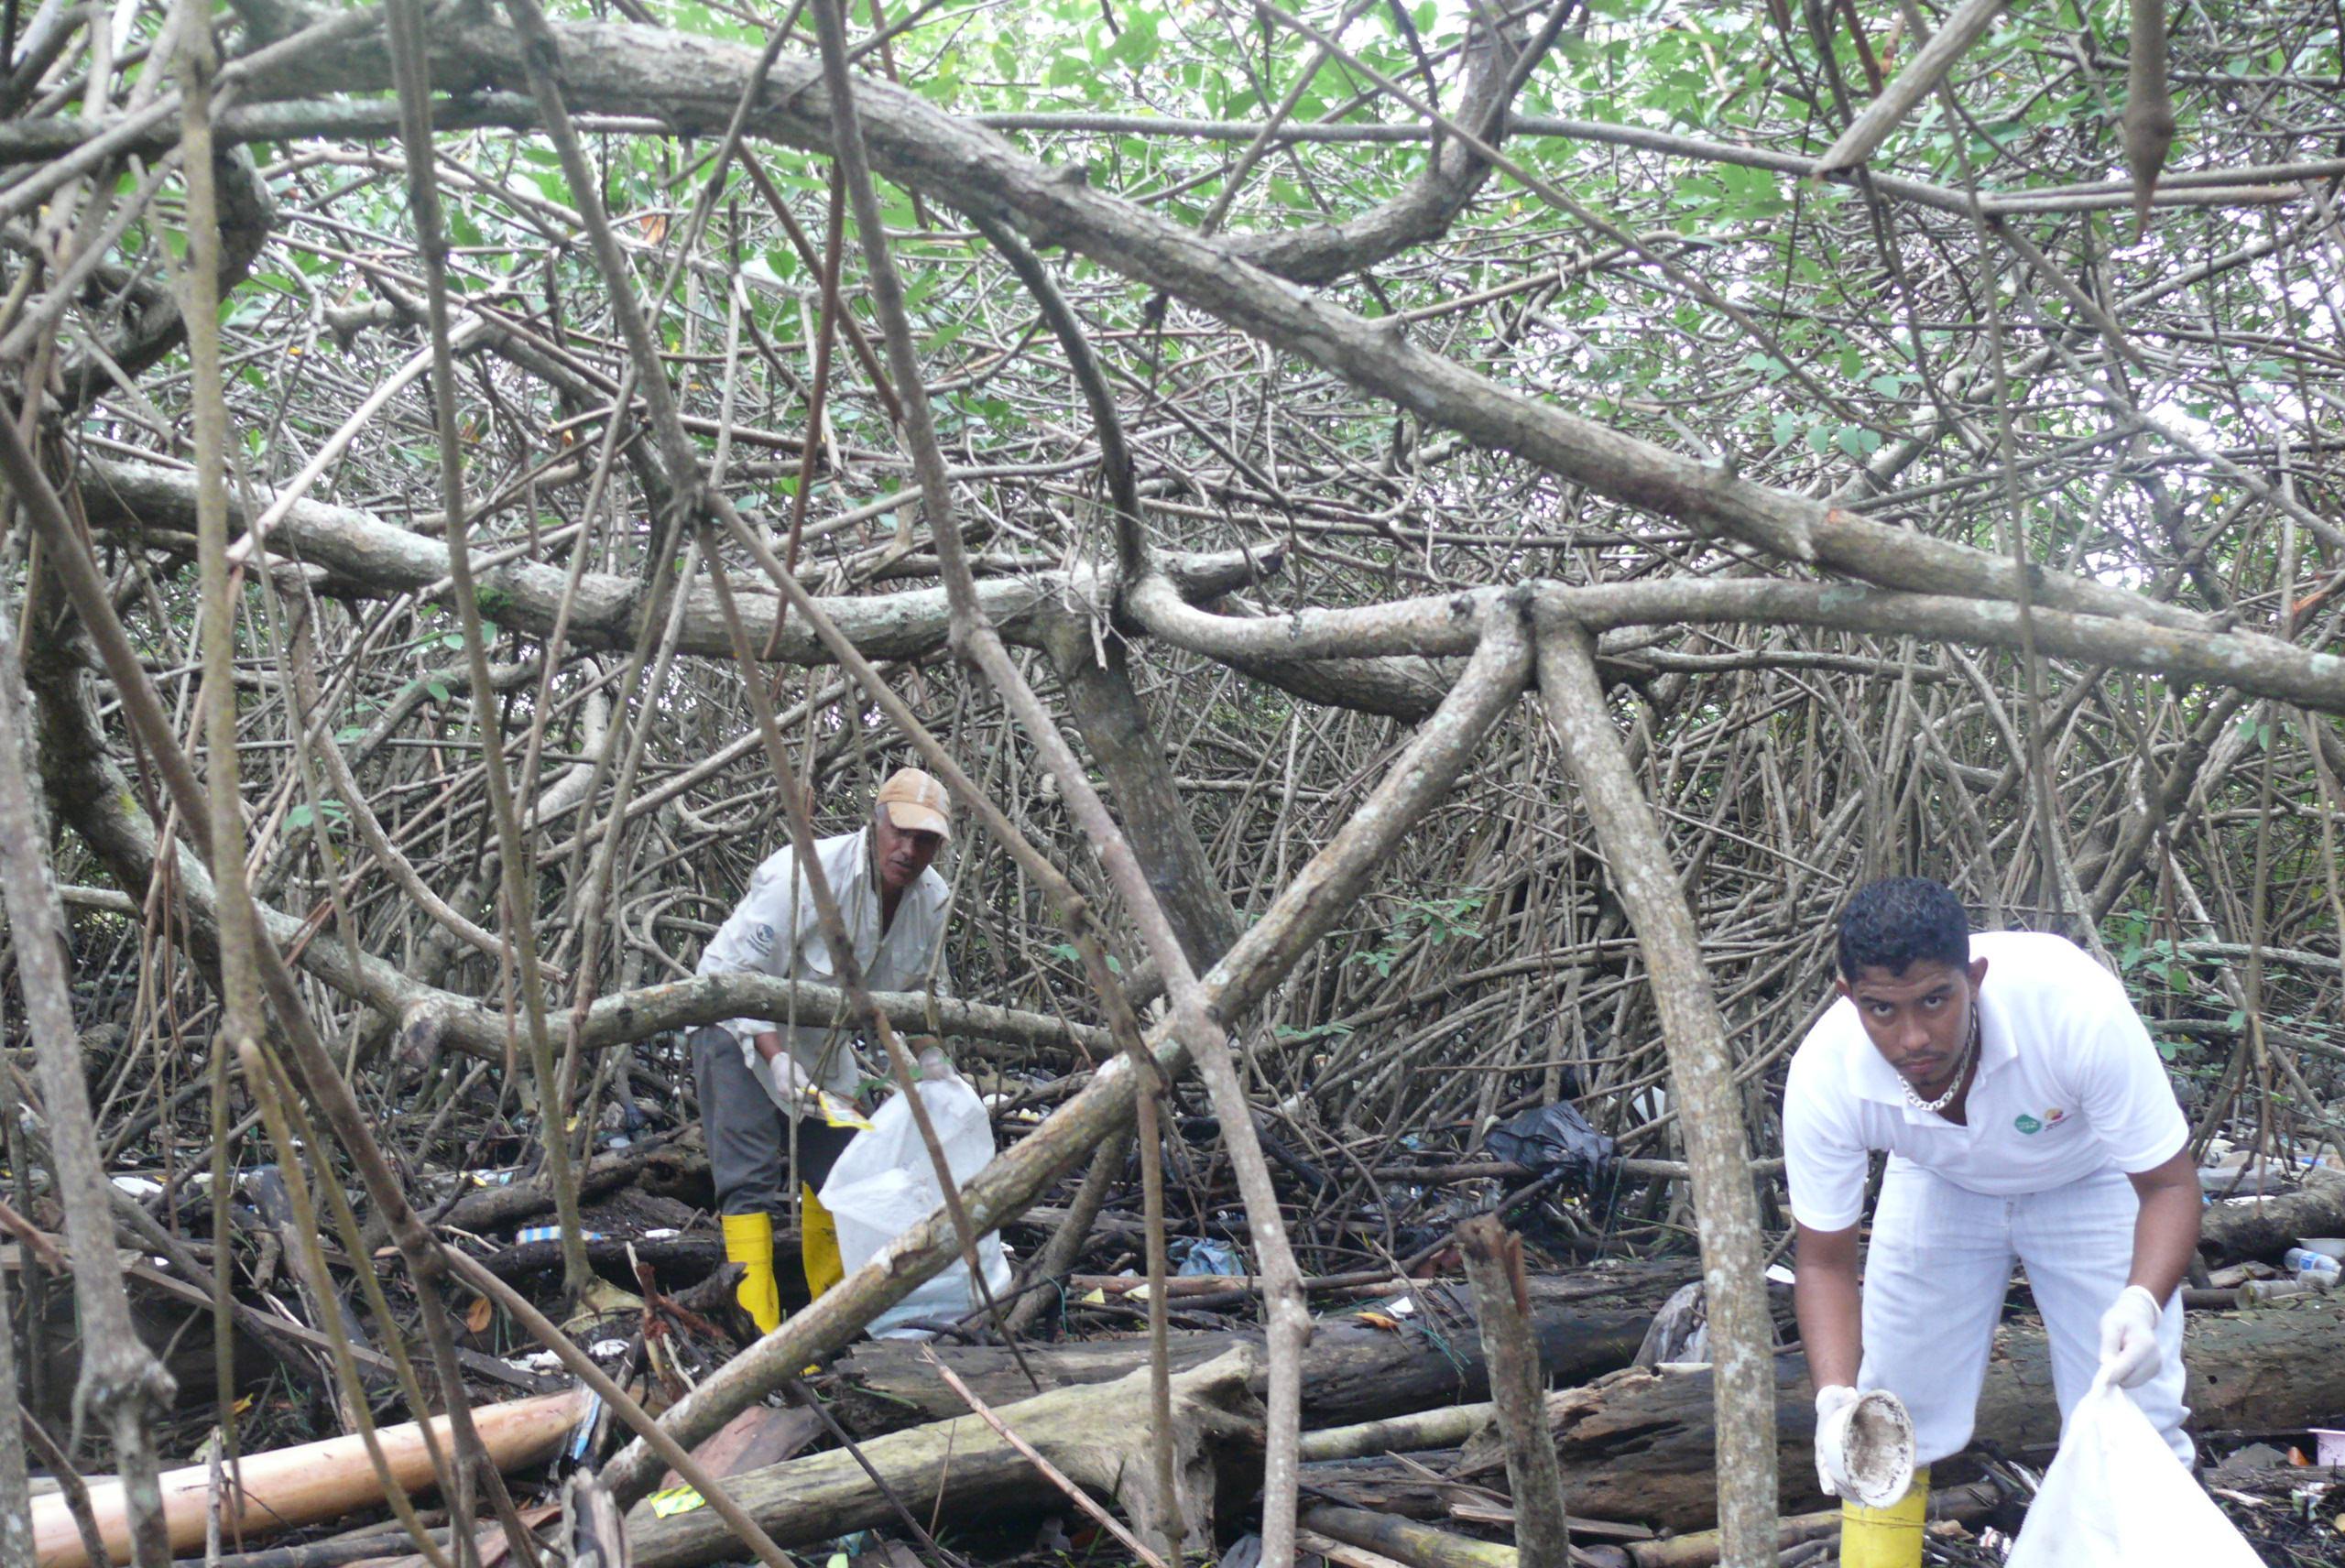 Cleaning up in the mangroves at Esmeraldas, Ecuador.